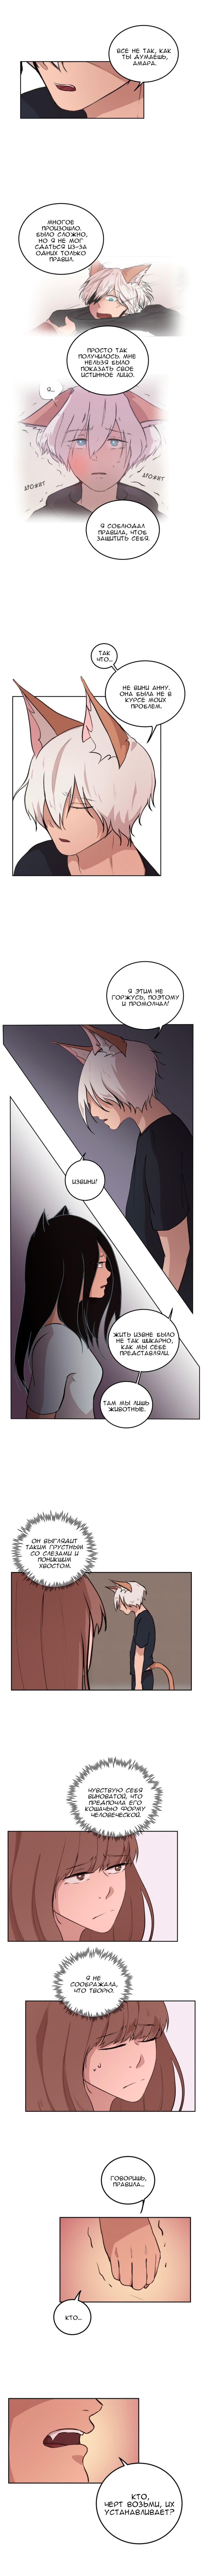 https://r1.ninemanga.com/comics/pic2/58/31802/416859/1533717007465.jpg Page 3